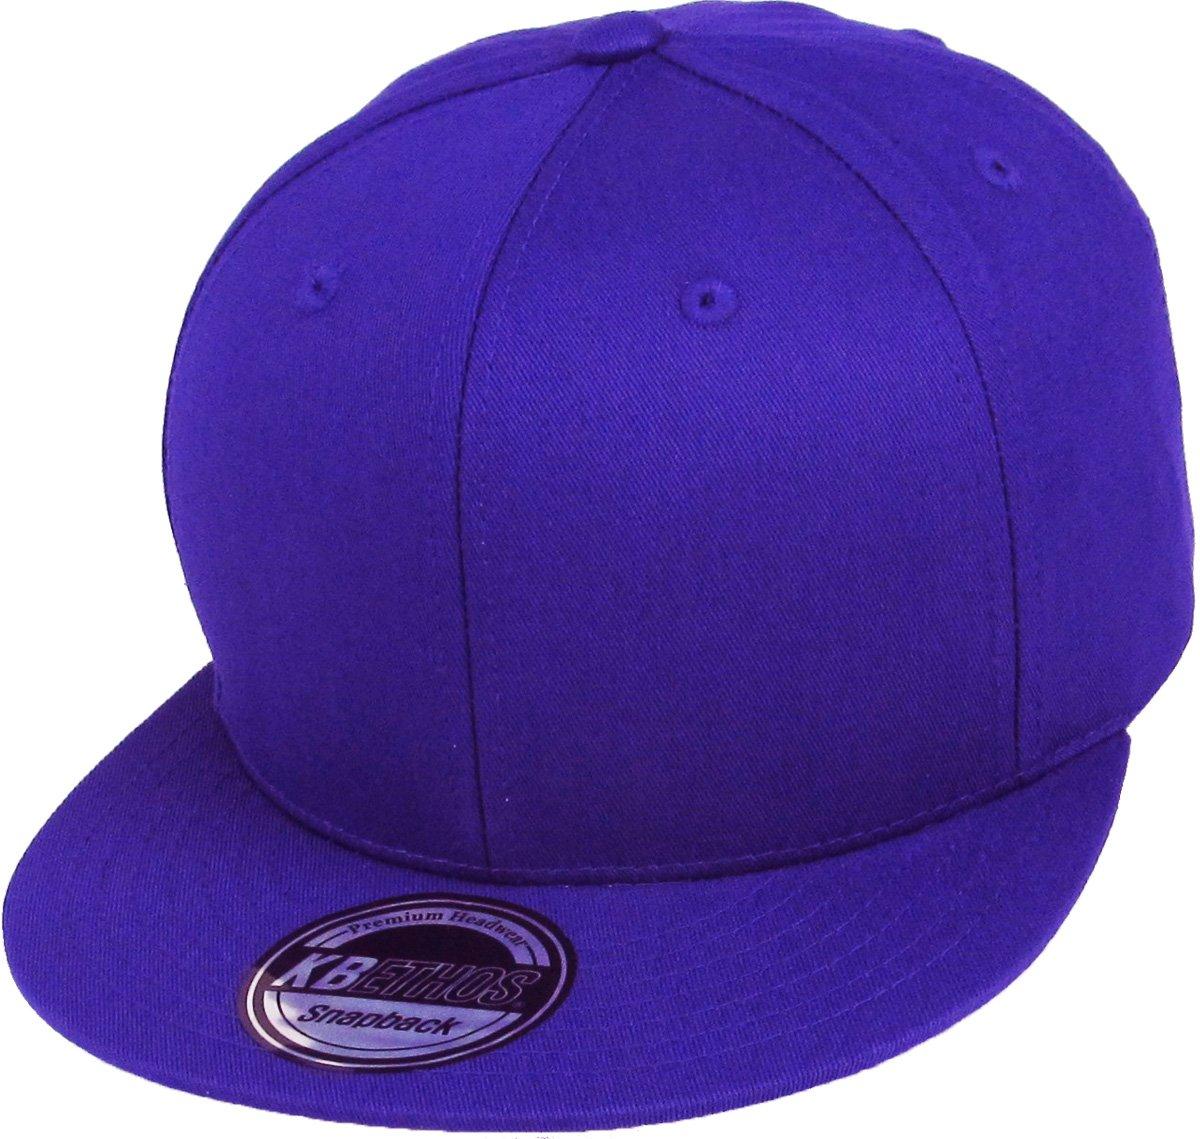 KNW-1467 PUR Cotton Snapback Solid Blank Cap Baseball Hat Flat Brim 7c466db618e7